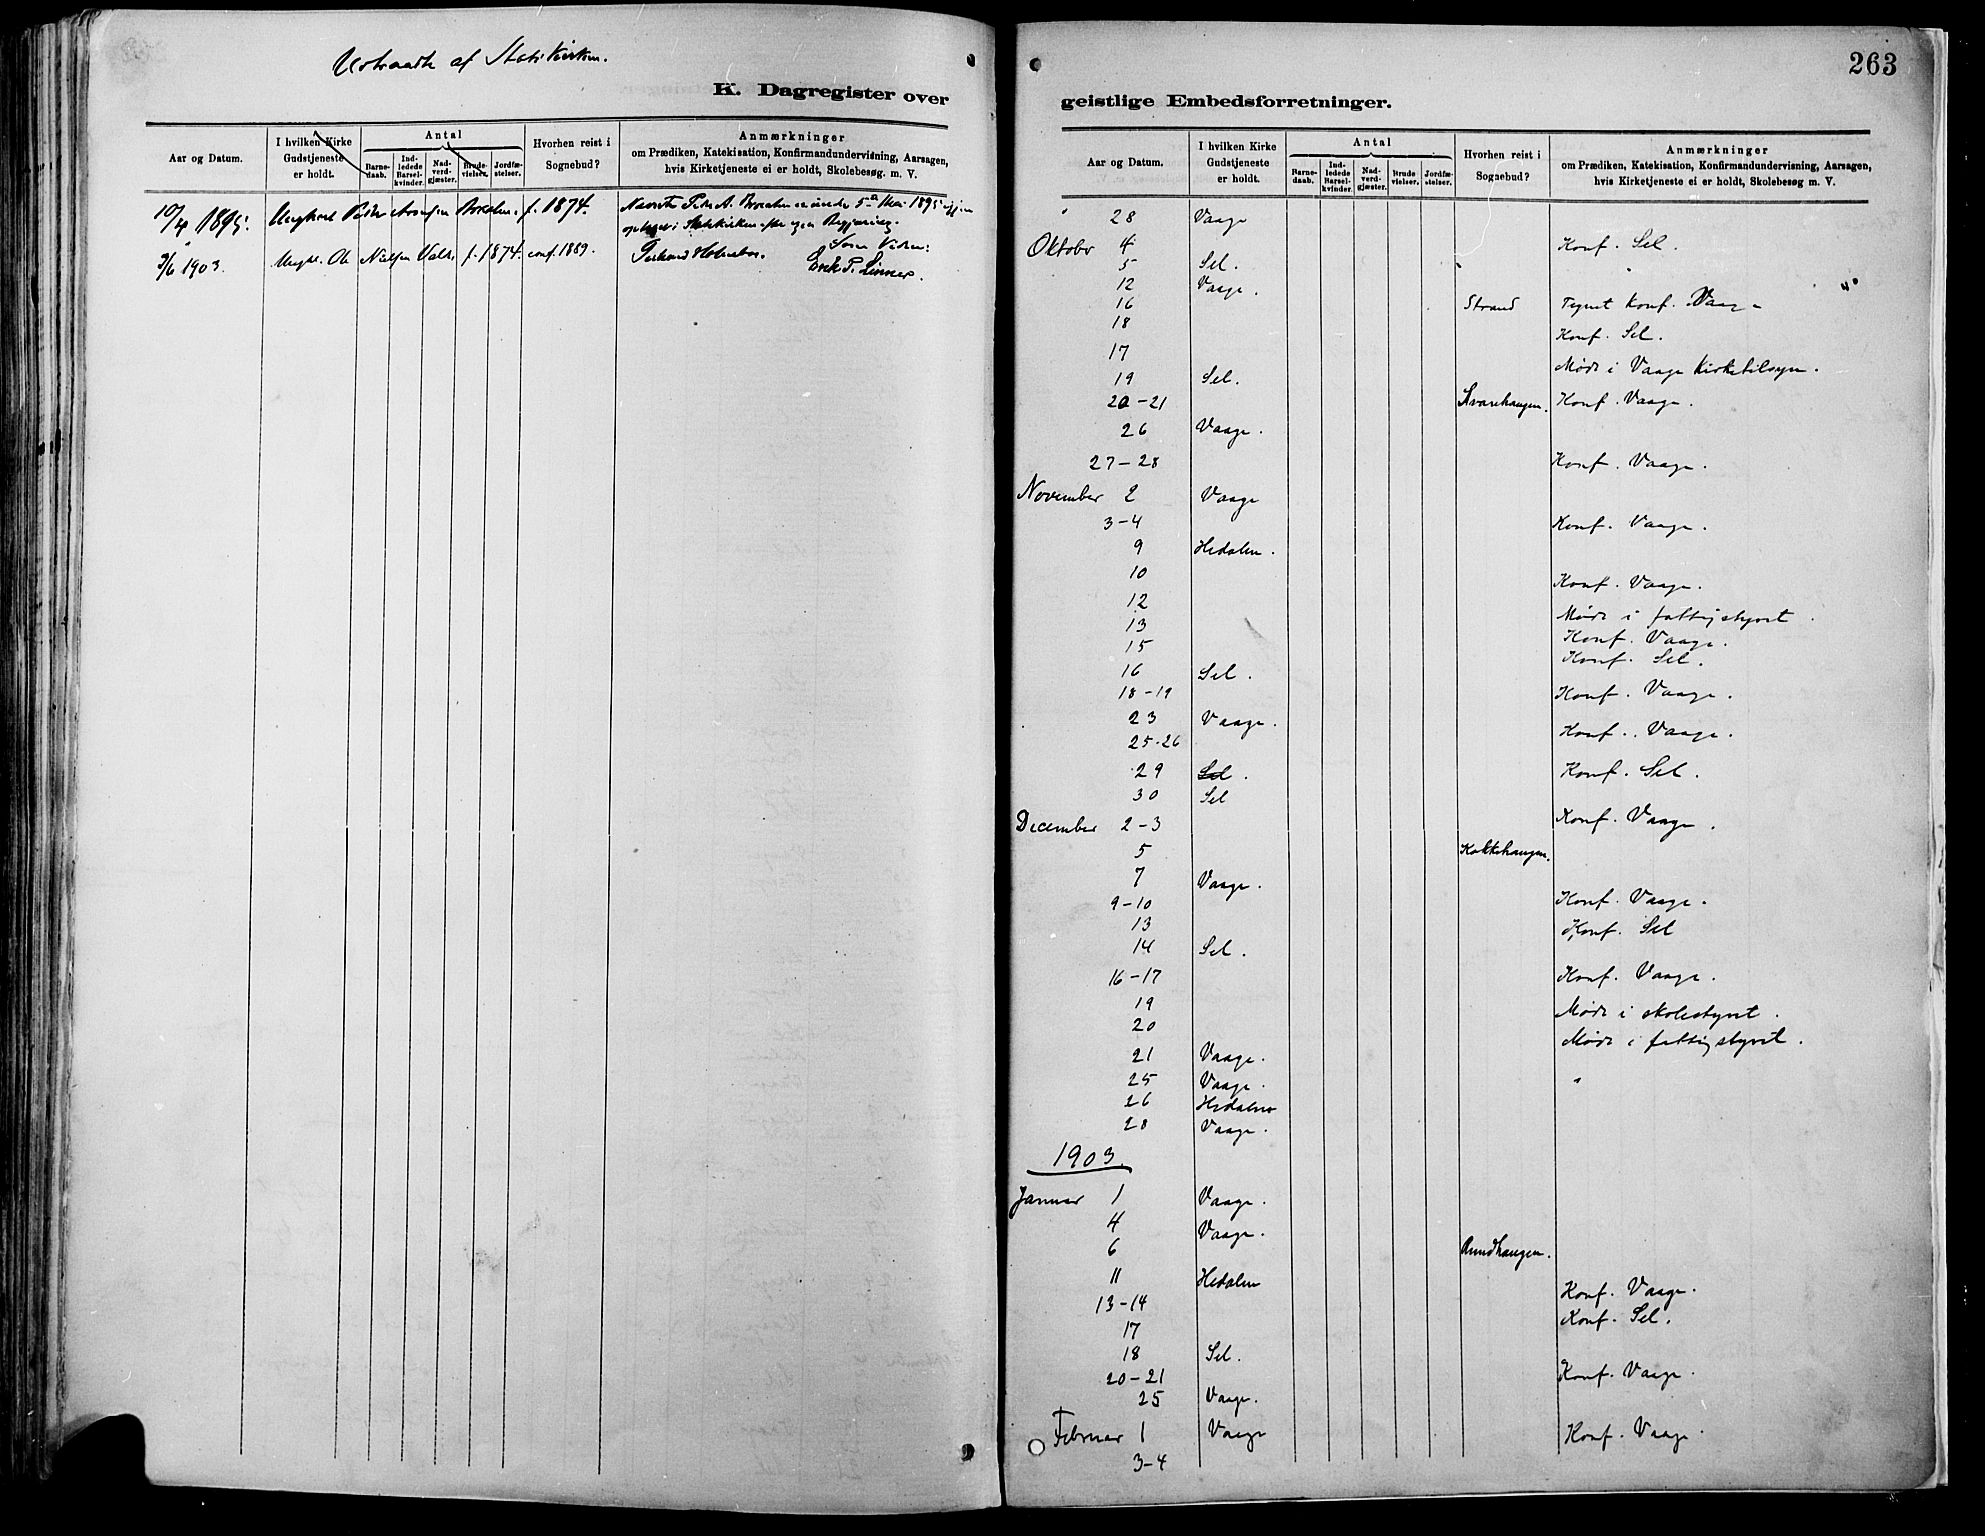 SAH, Vågå prestekontor, Ministerialbok nr. 9, 1886-1904, s. 263